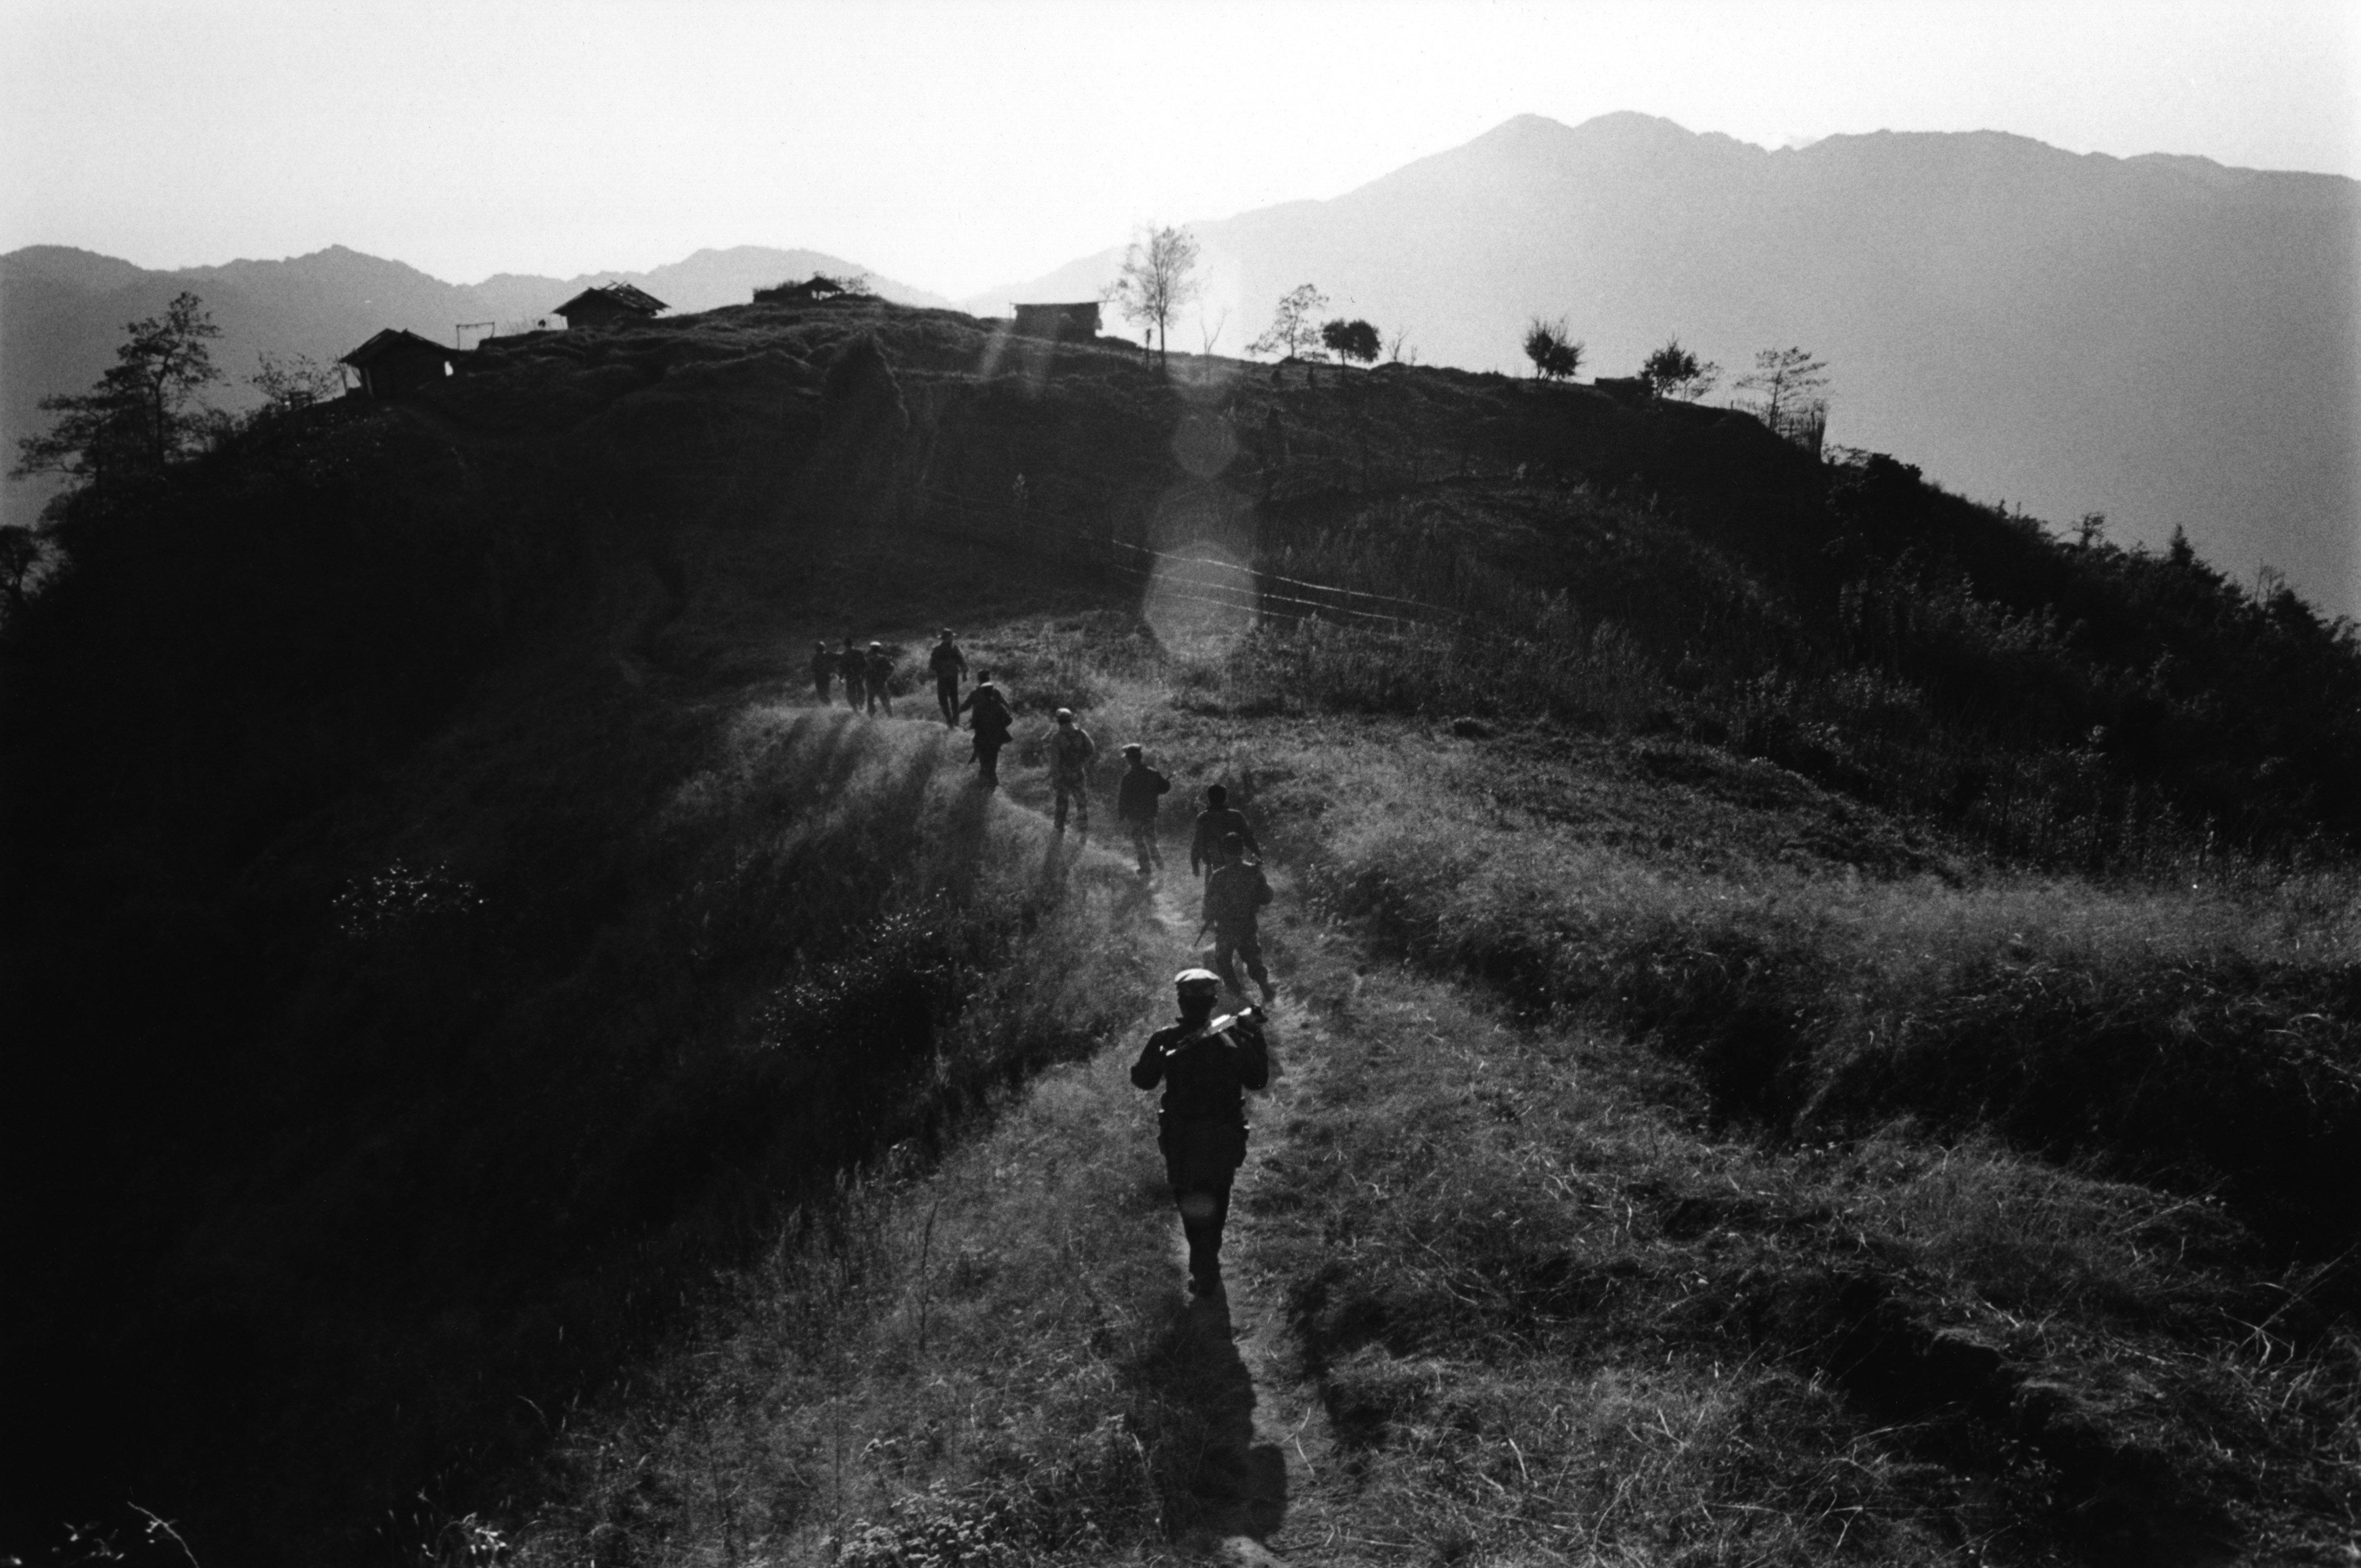 Soldiers of the Kachin Independence Army in Bum Sen, Kachin State, Burma (Myanmar)